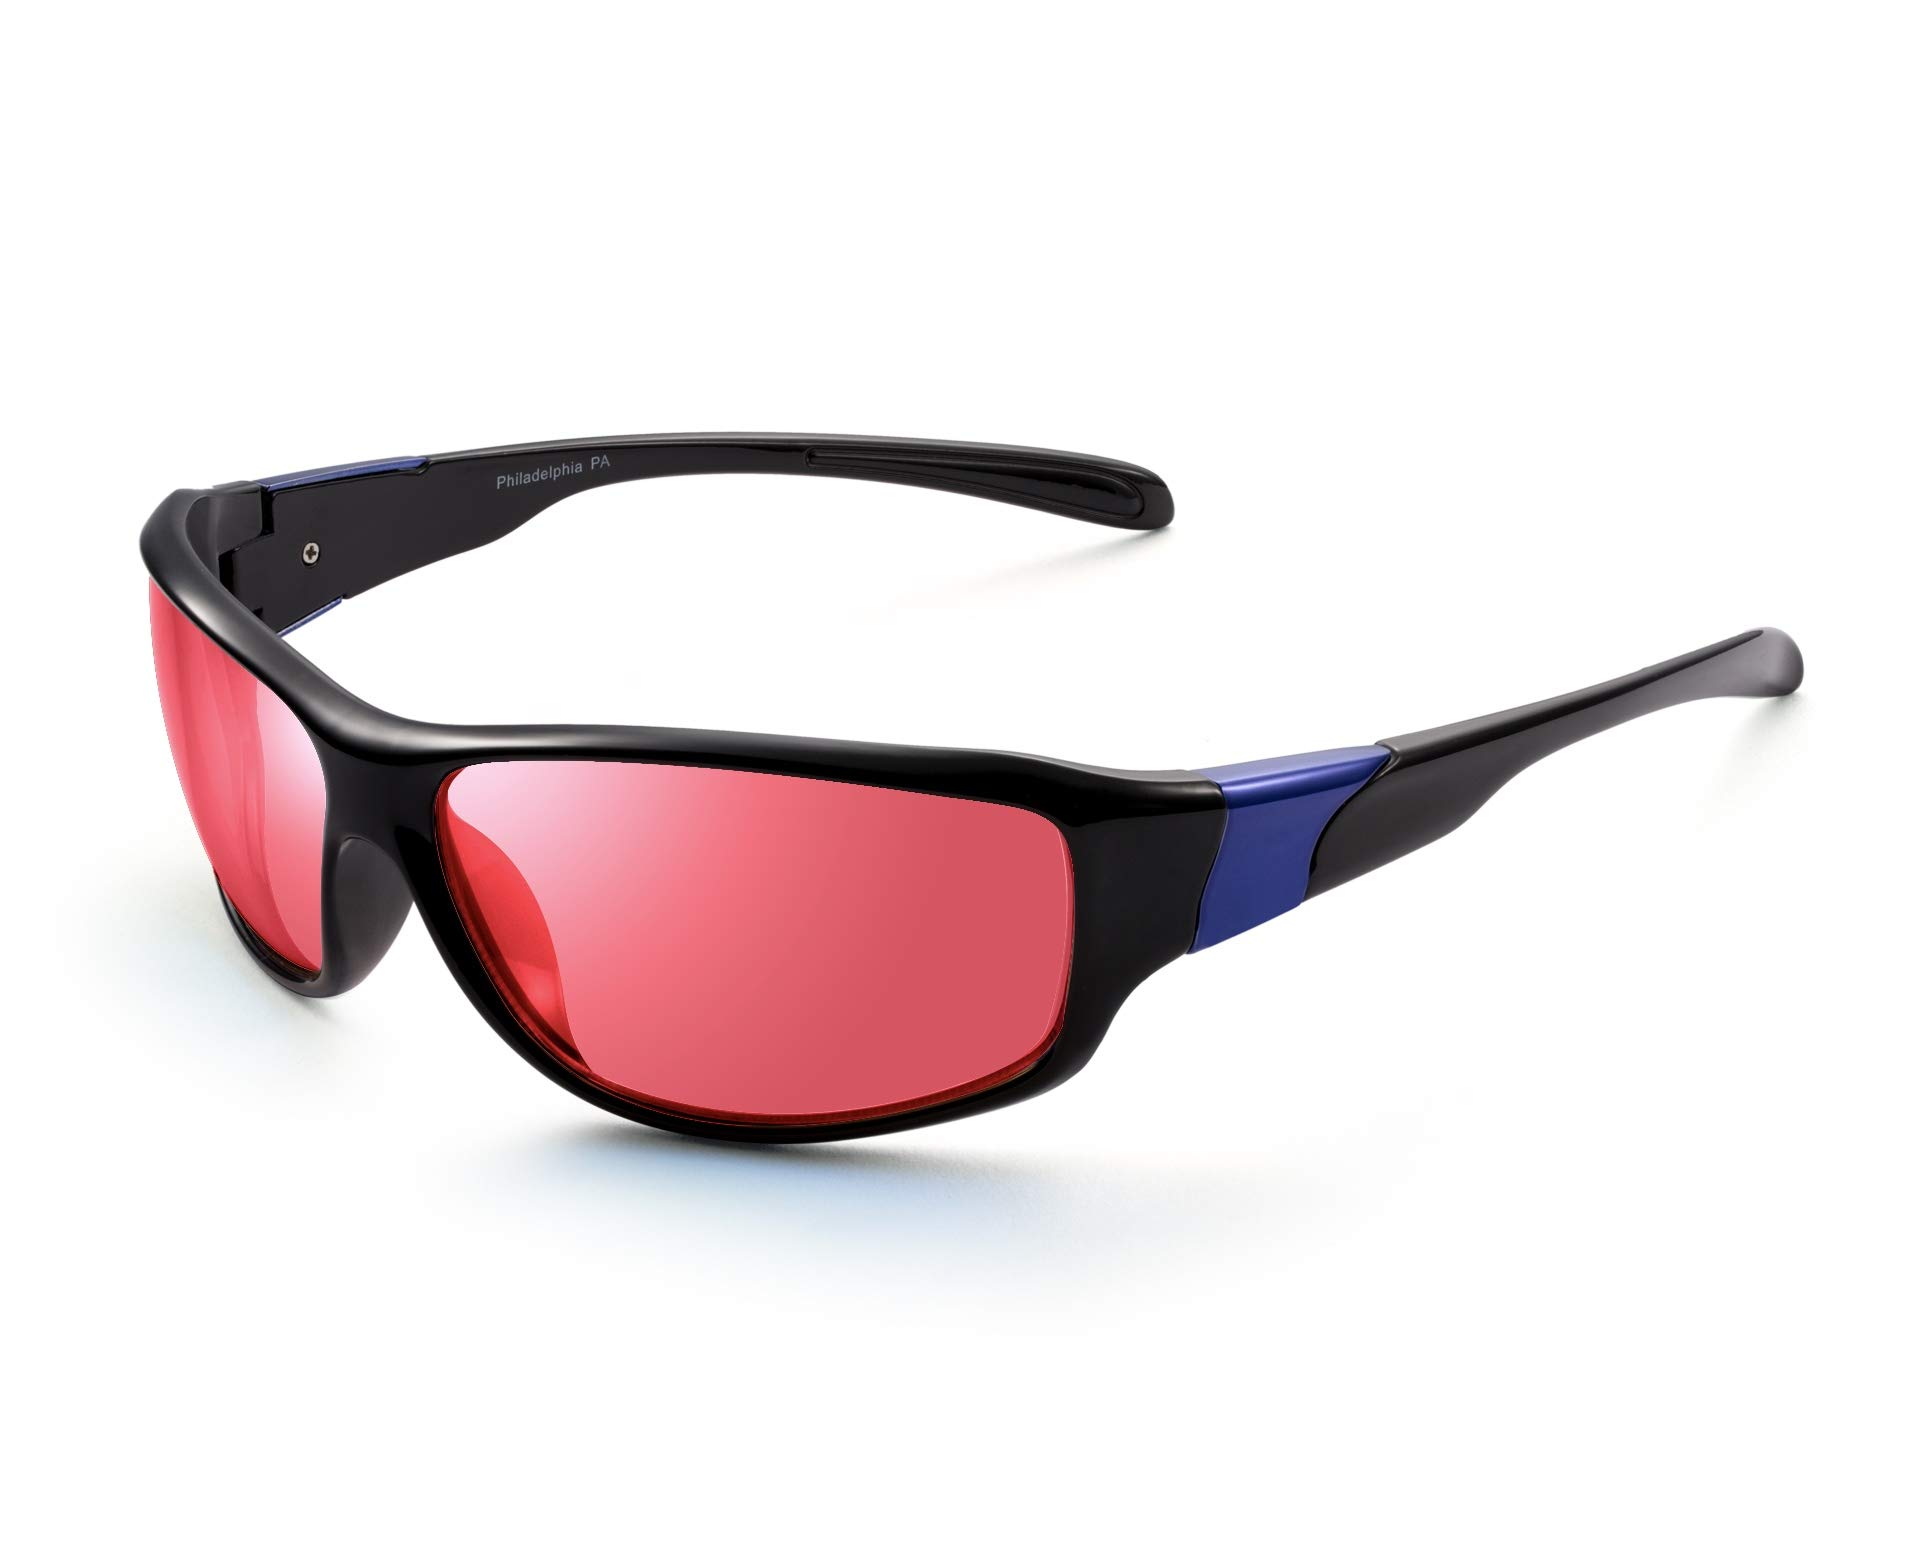 Pilestone TP-016 Color Blind Corrective Glasses for Red-Green Blindness - Streamline Sports Use